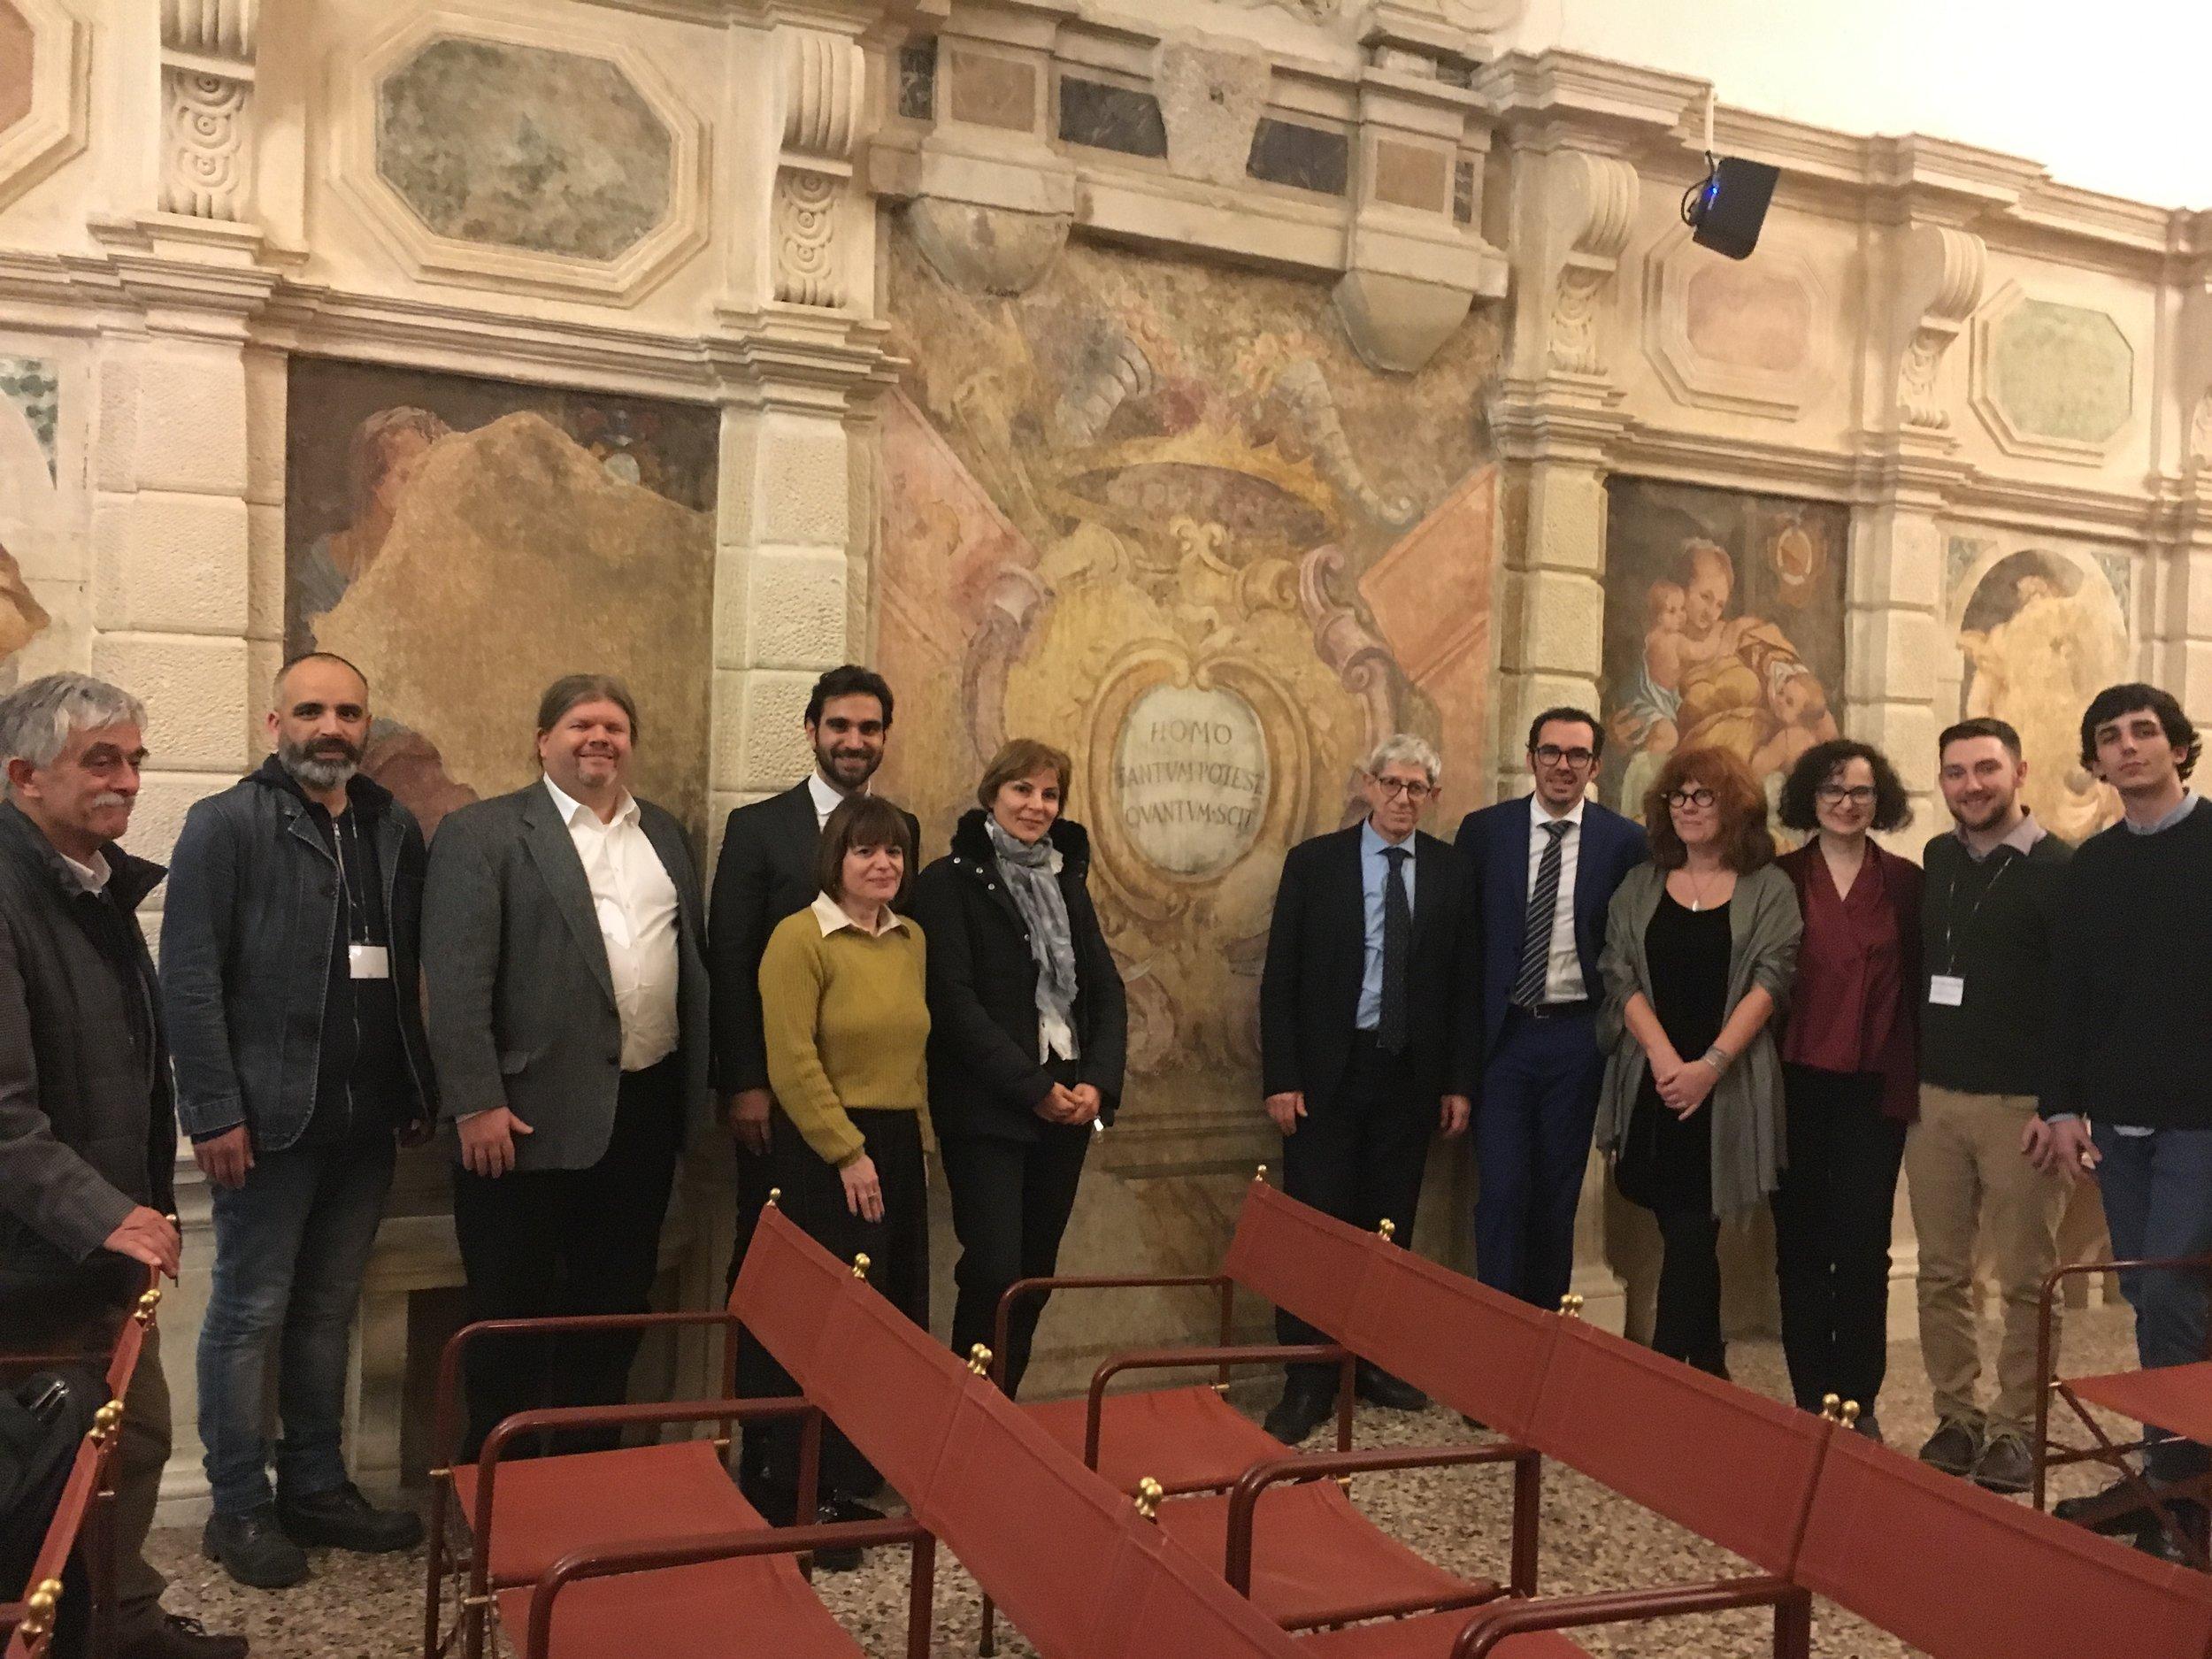 The invited speakers at the 2018 University of Padua Debate laboratory.